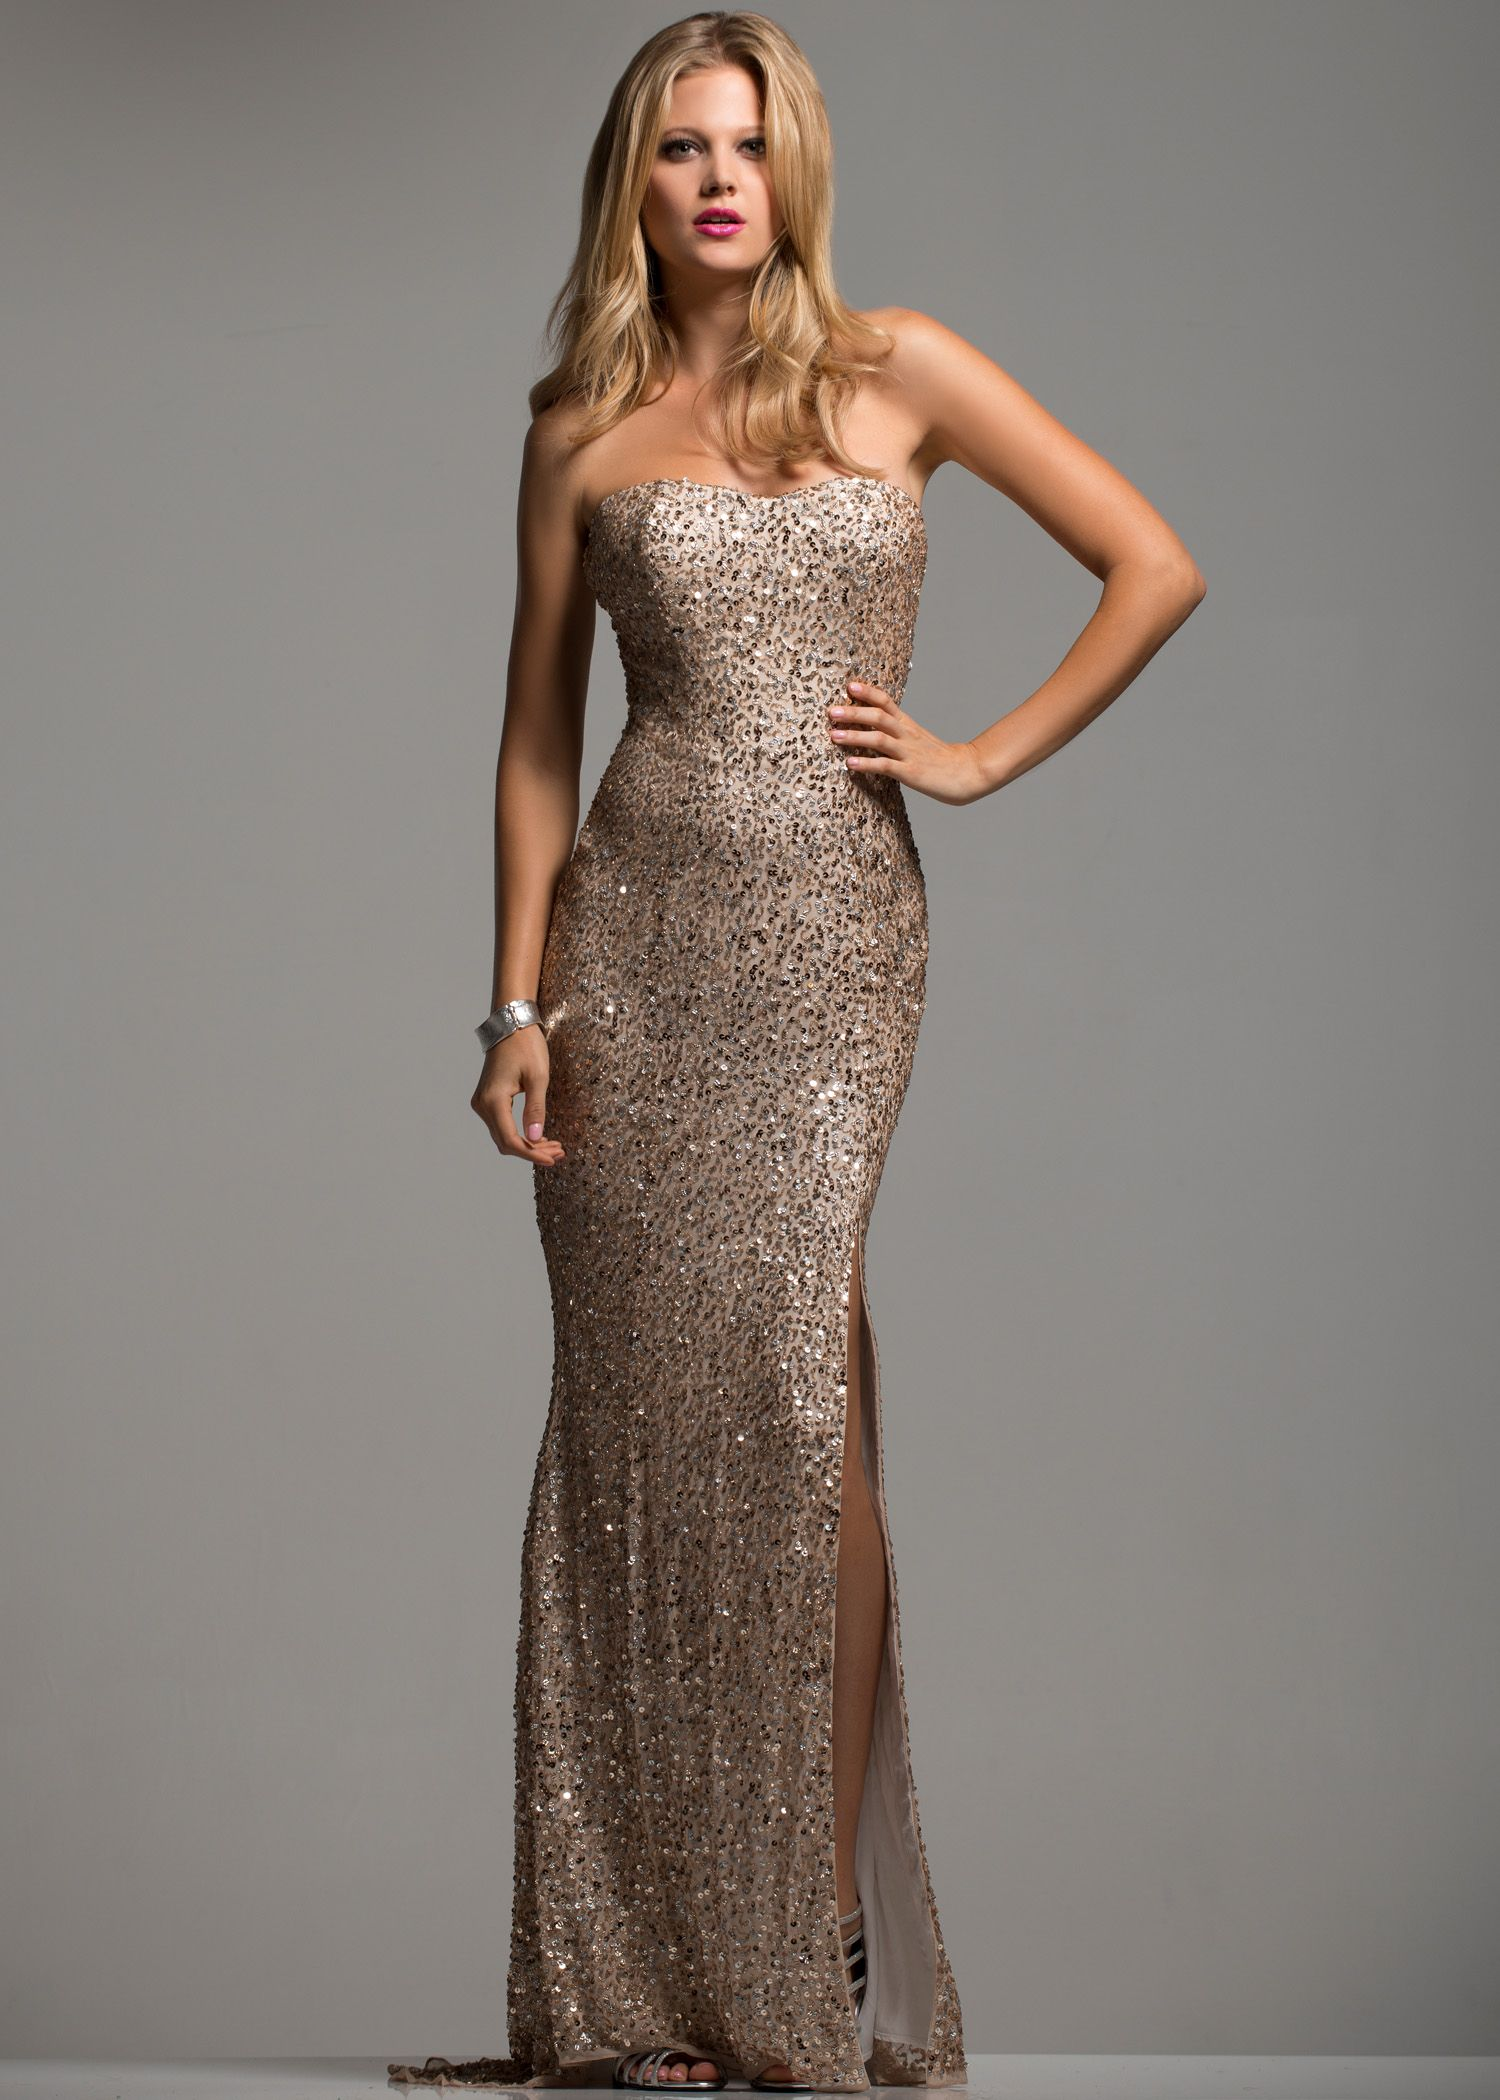 Champagne colored prom dresses fancy dresses pinterest